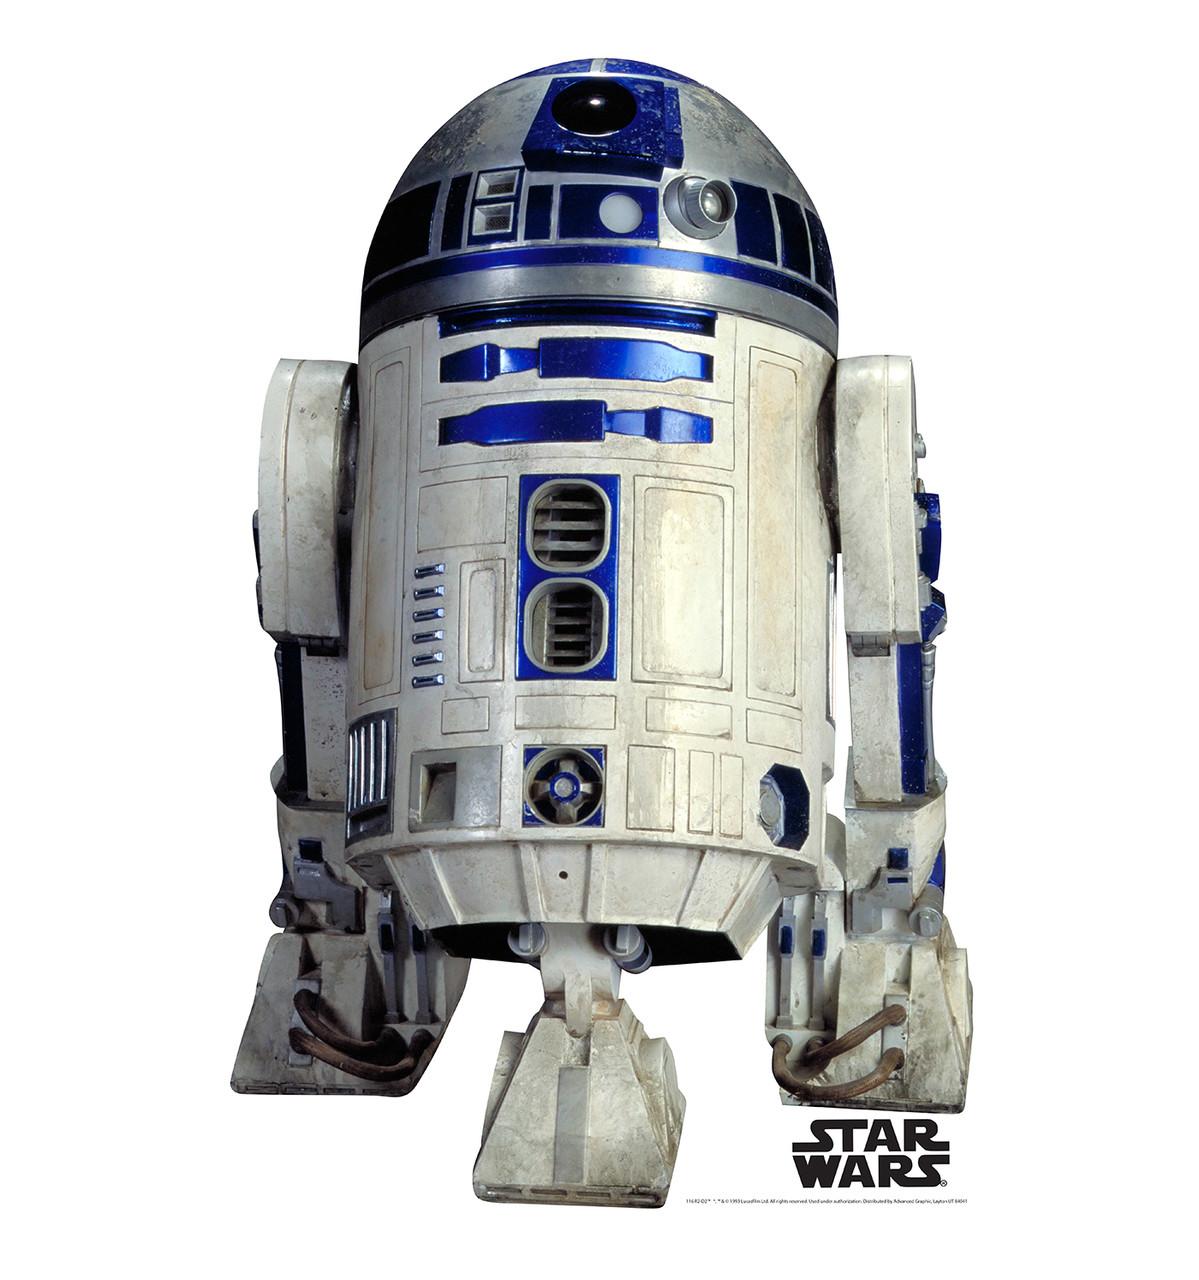 Life-size R2-D2 Cardboard Standup | Cardboard Cutout